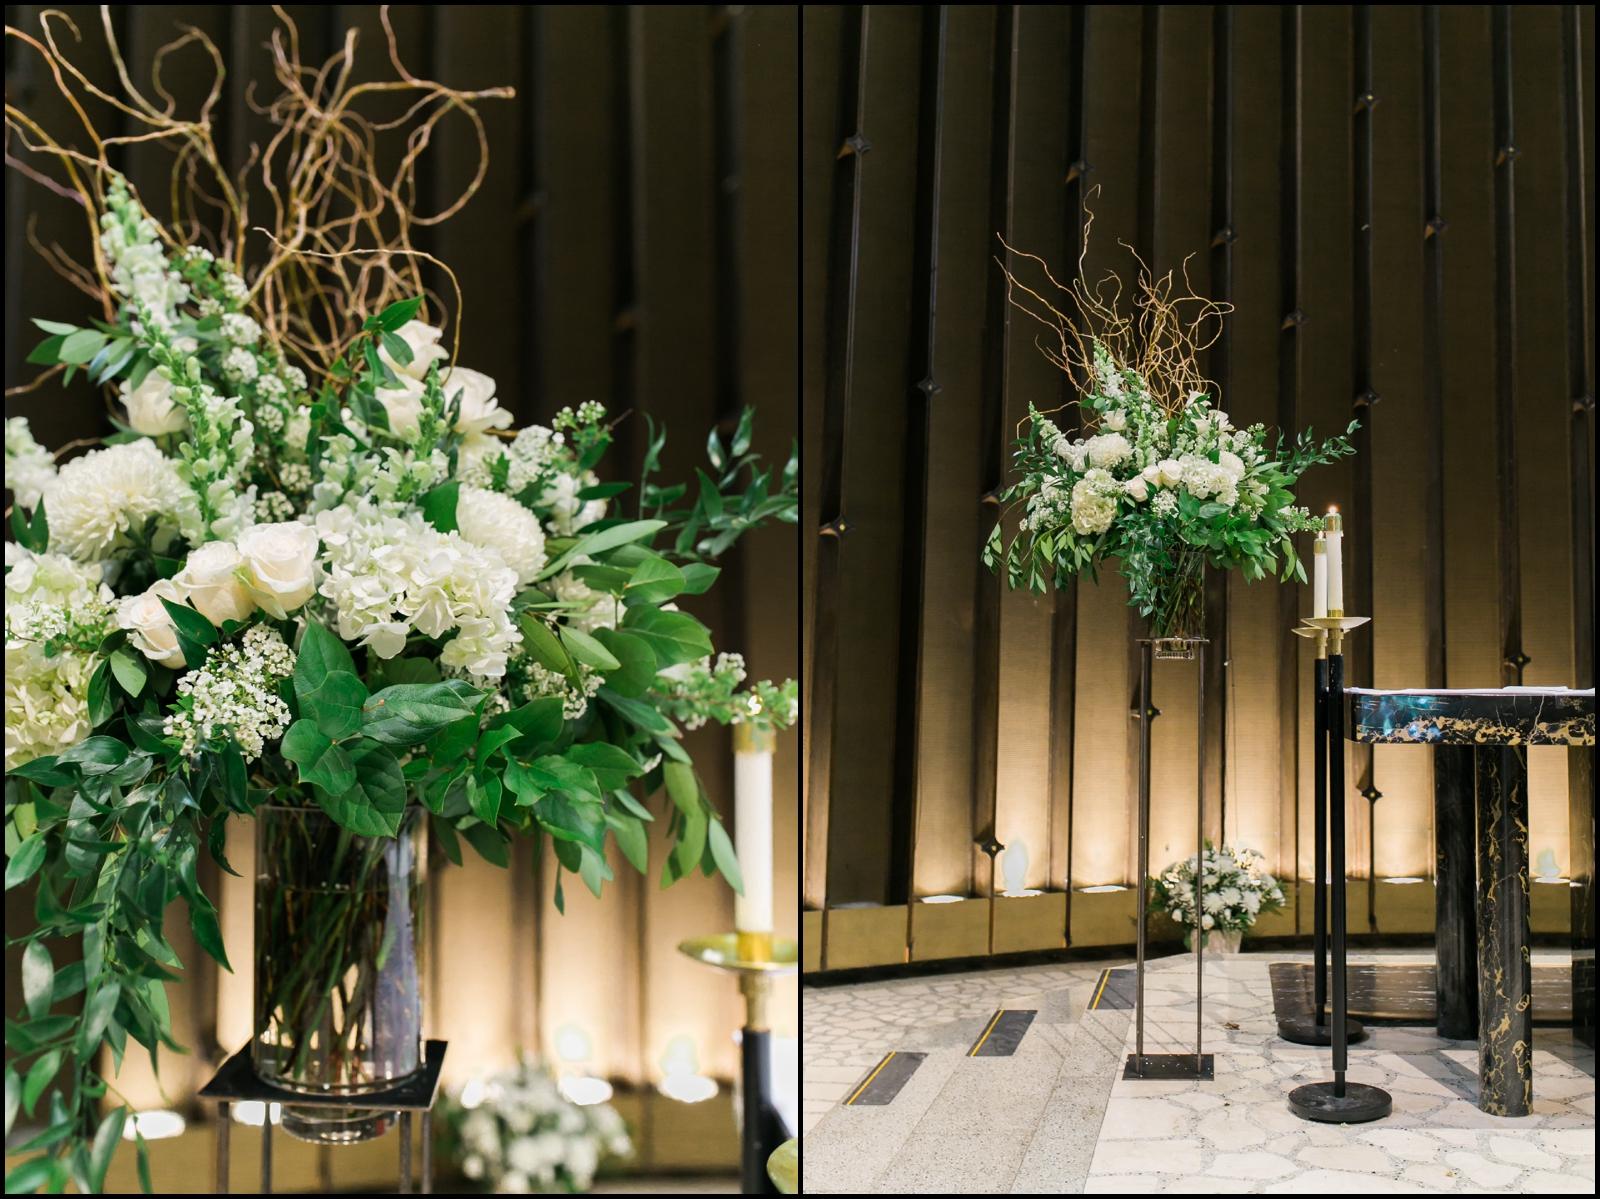 MPLS wedding ceremony